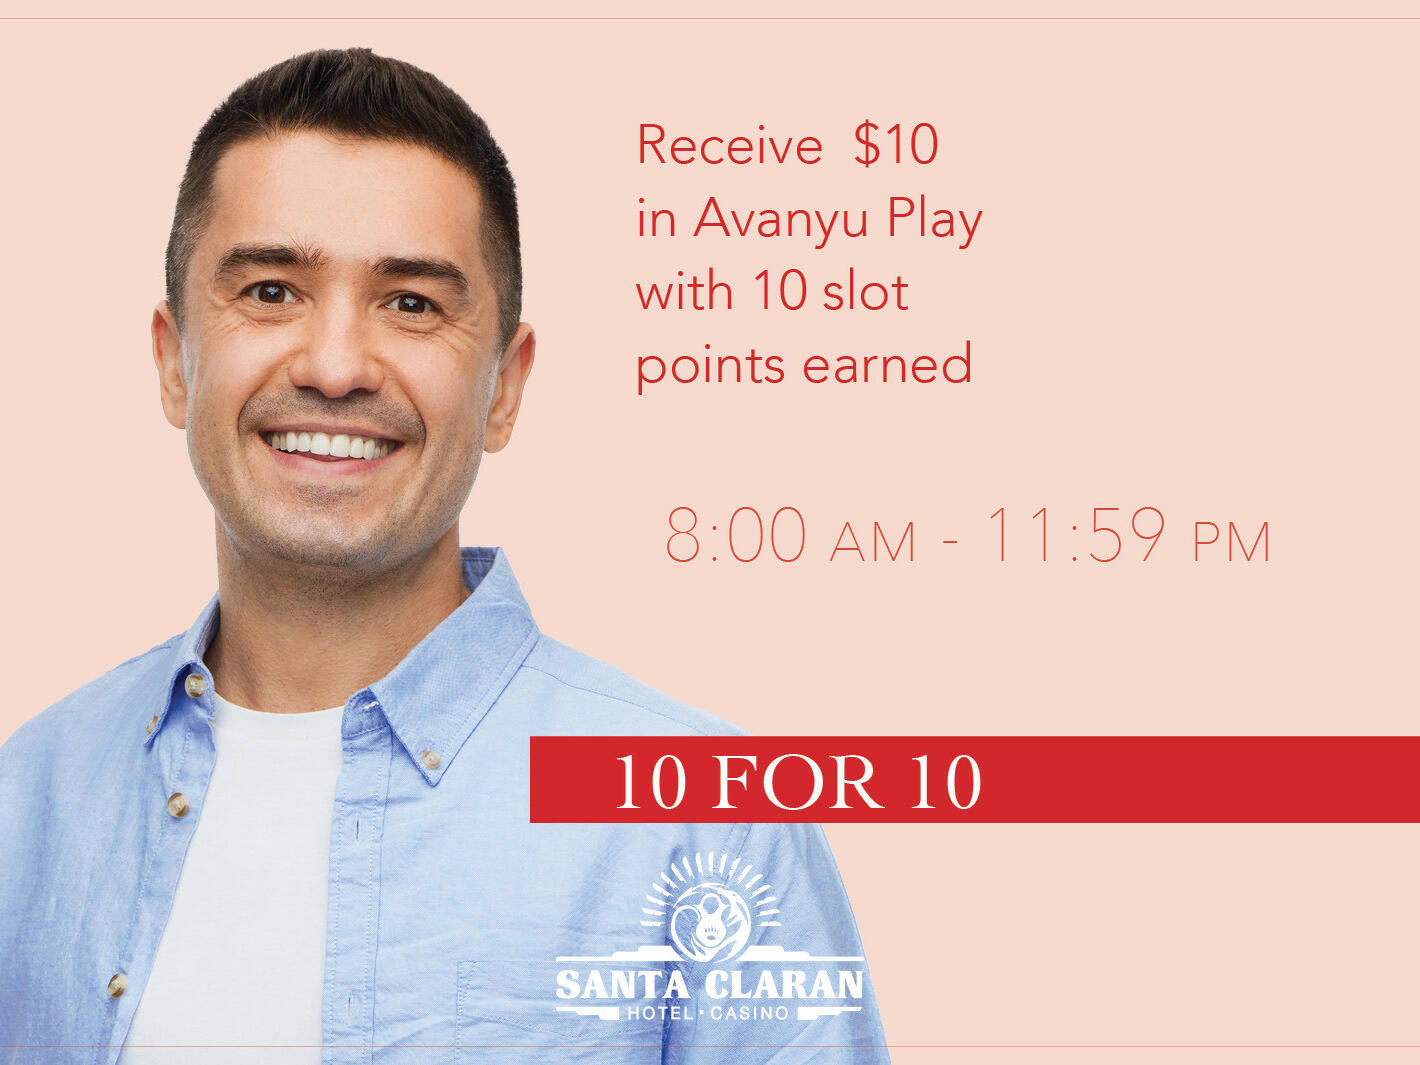 Poster of 10 FOR 10 at Santa Claran Hotel Casino